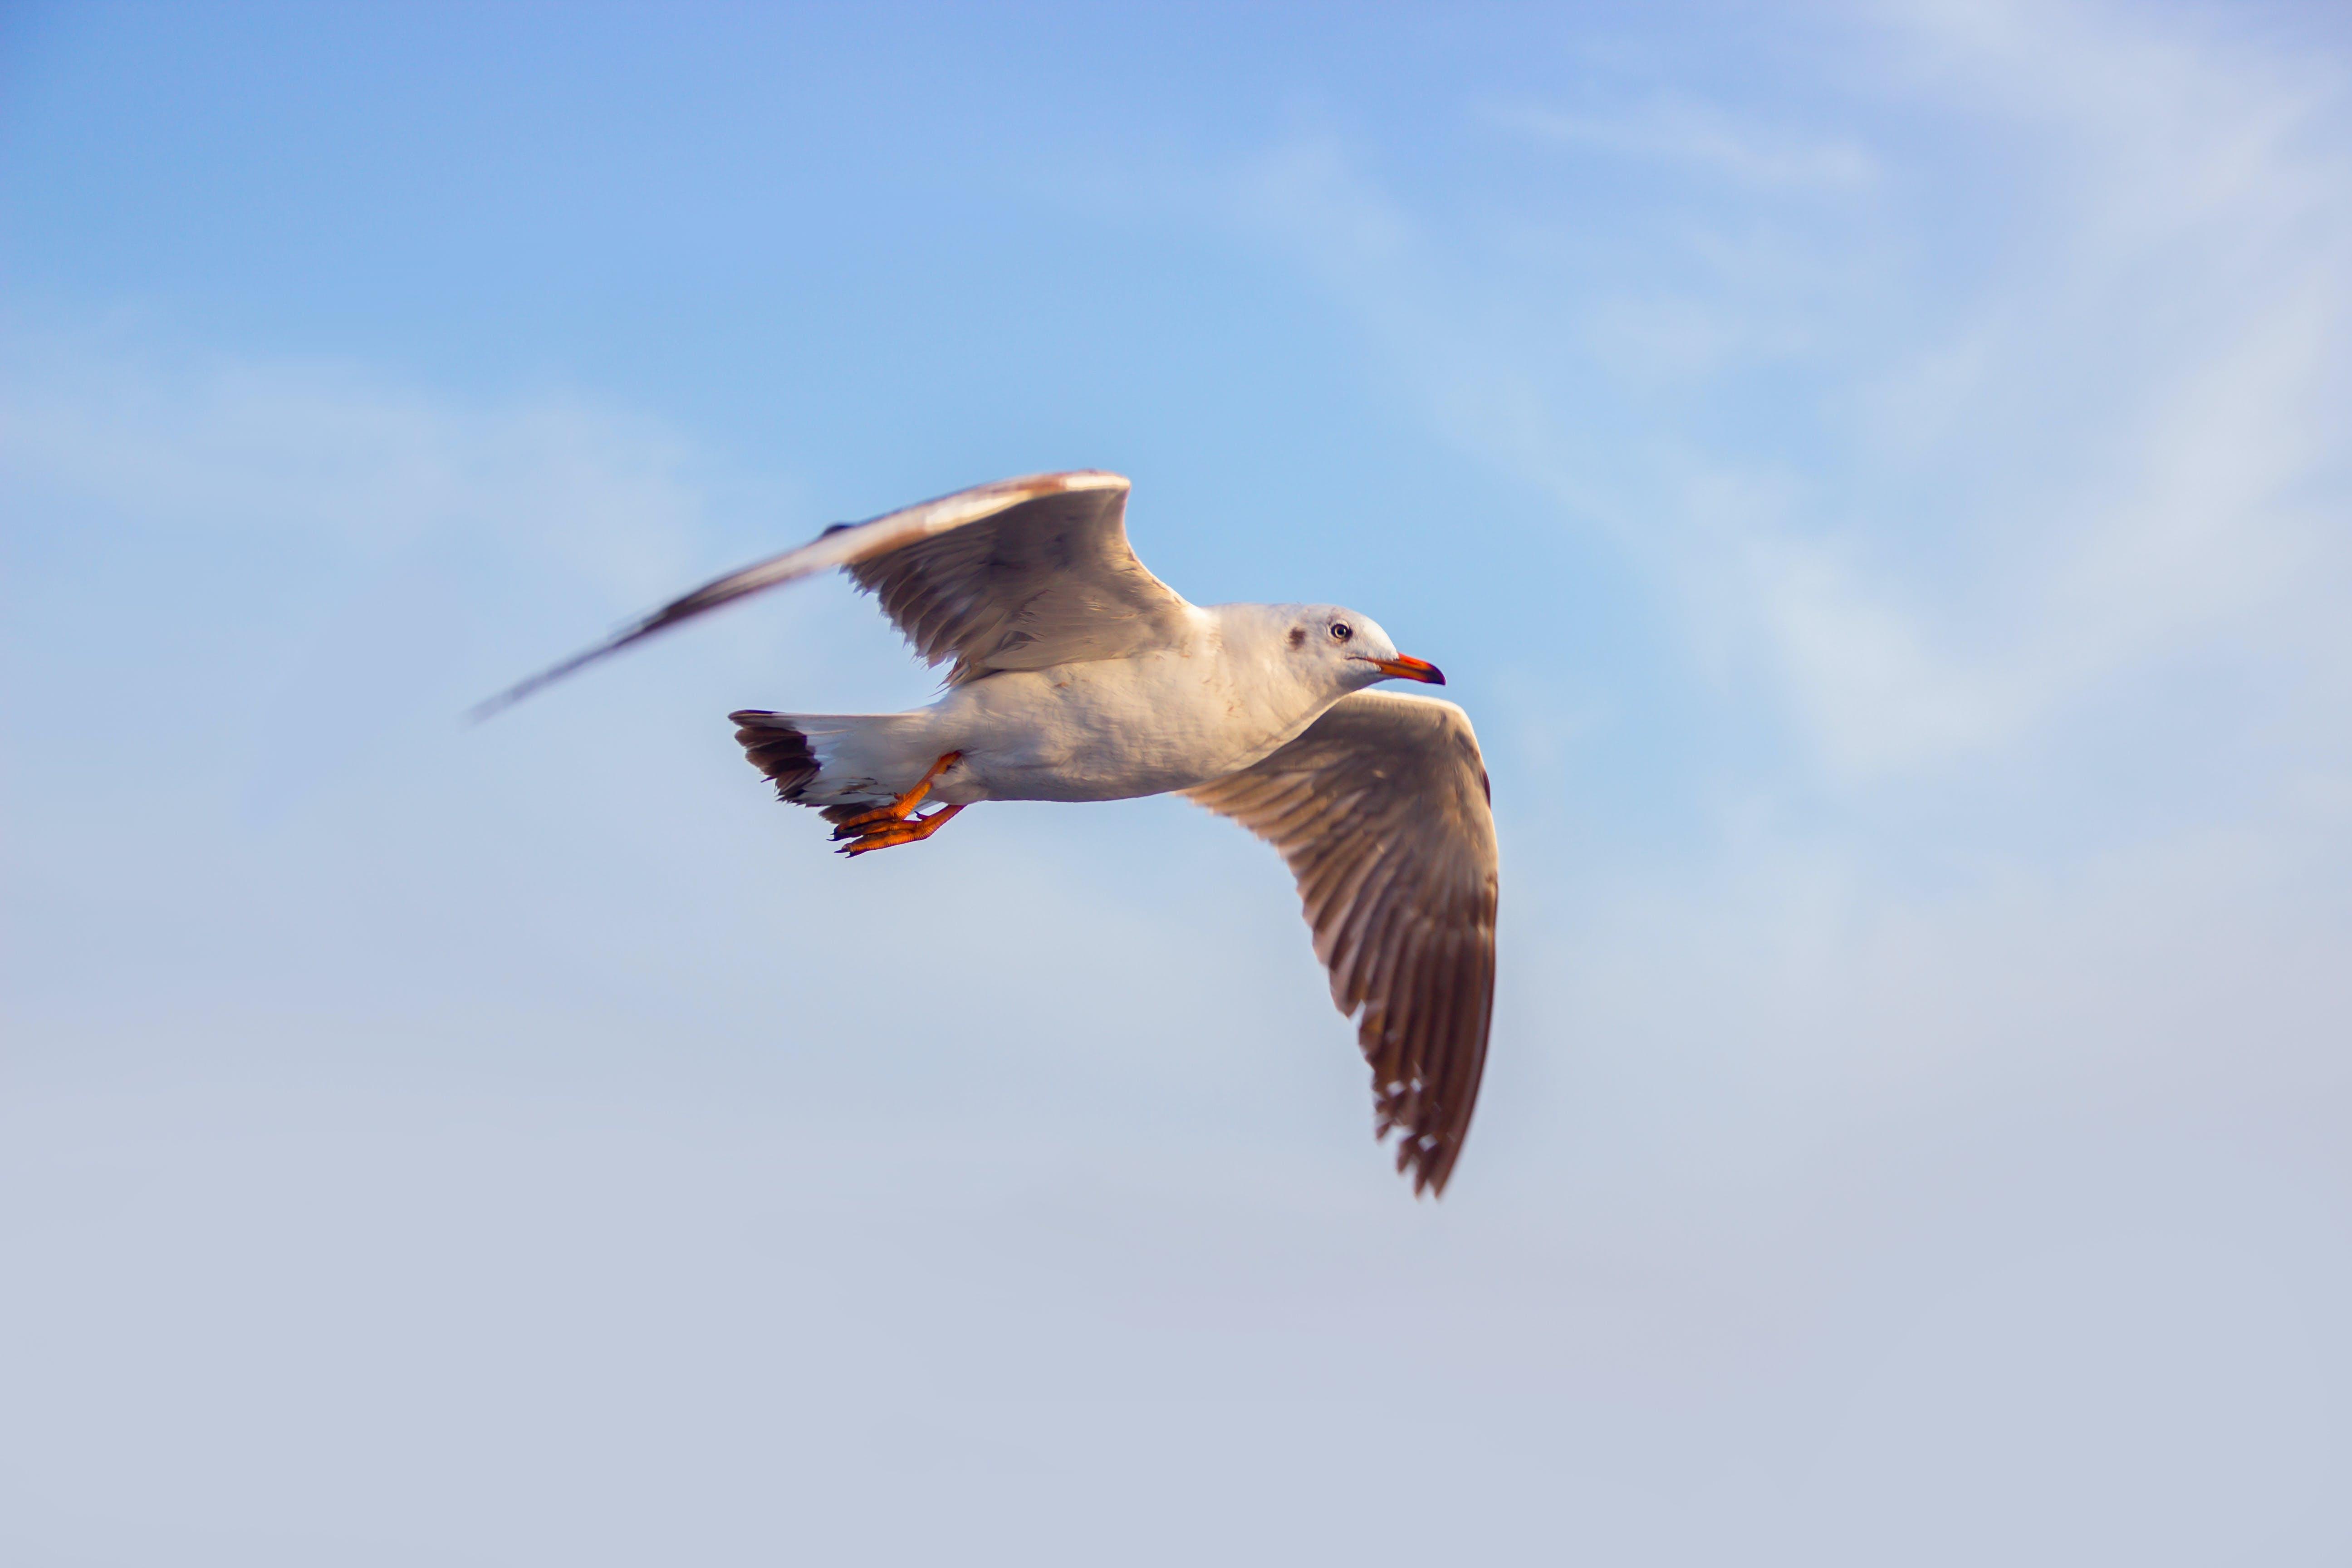 Photo of White Seagull Flying Under Blue Sky